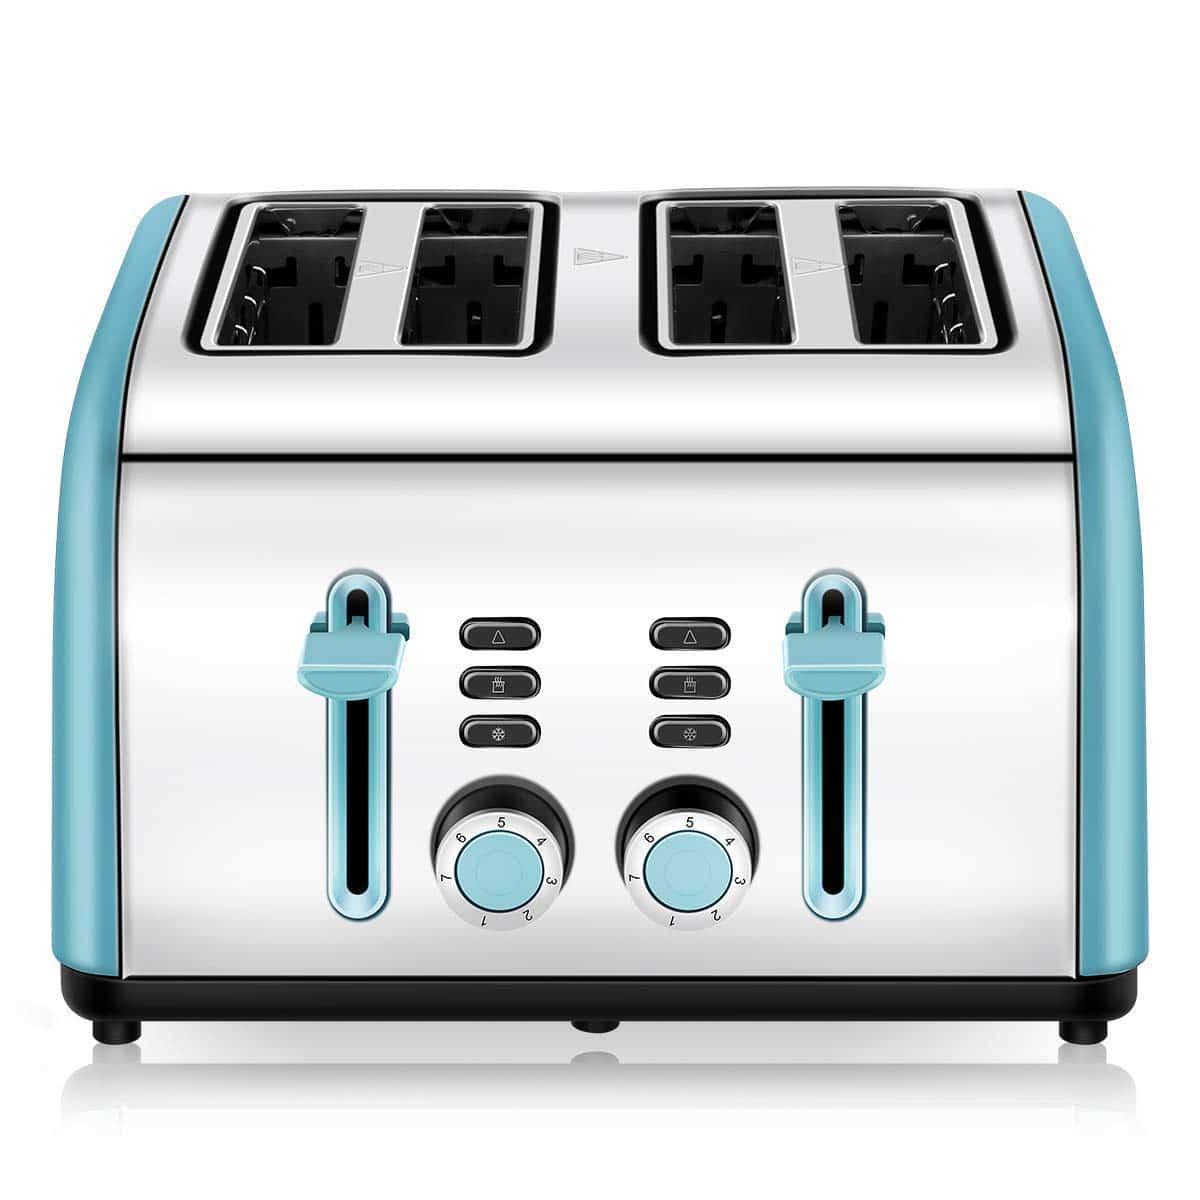 4-Slice Toaster, CUSINAID 4 Wide Slots Stainless Steel Toasters